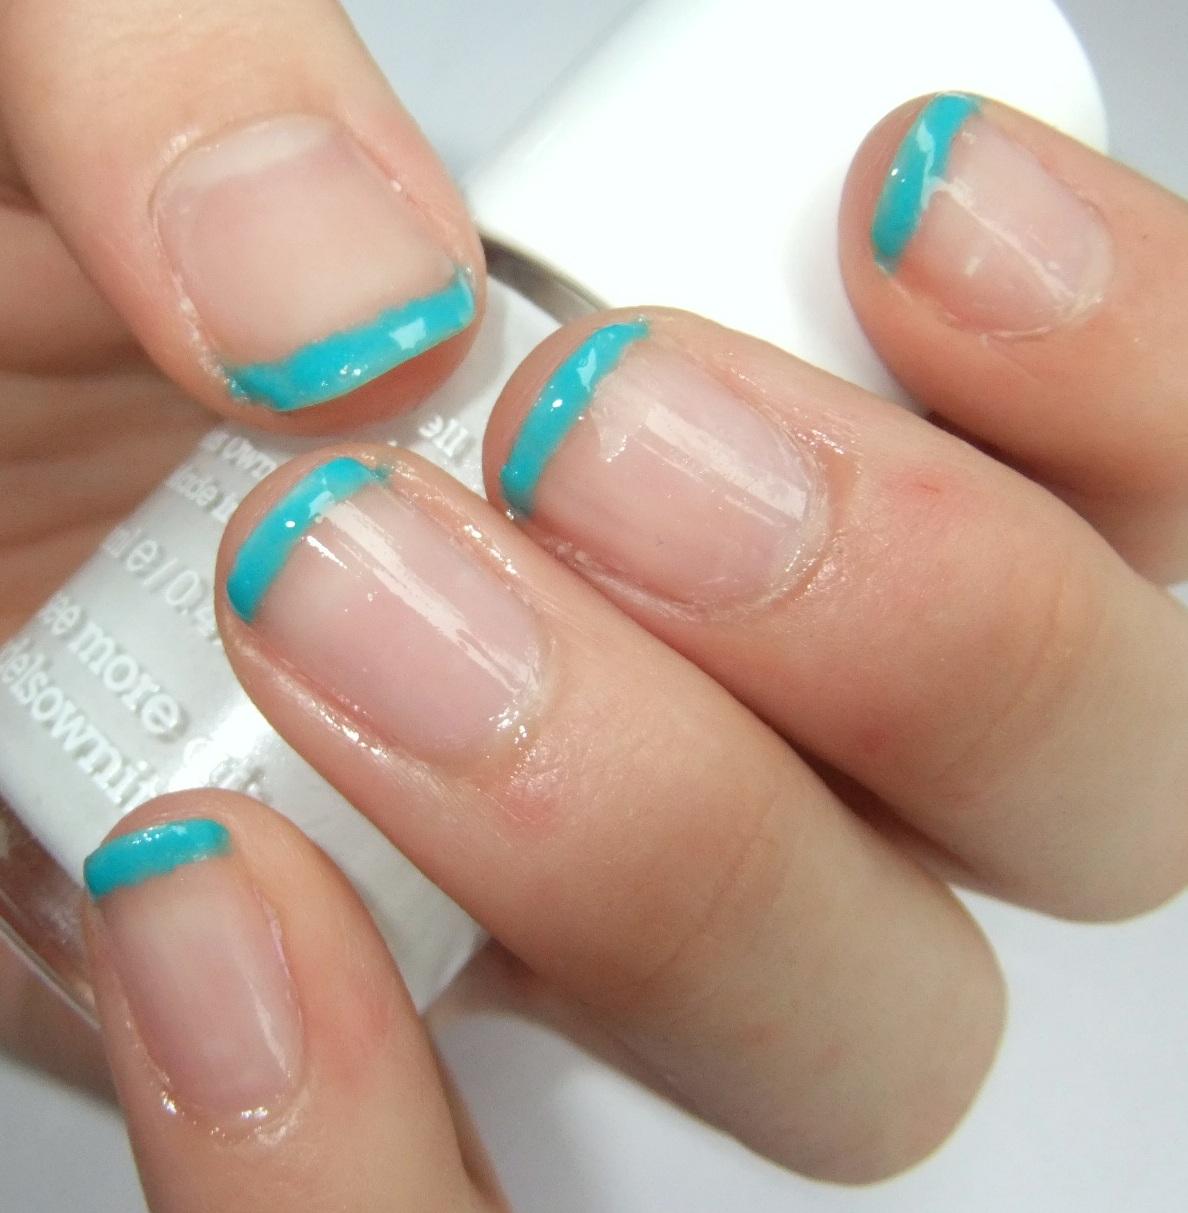 GretalRabbit Writes: Challenge Week 45: French Manicure